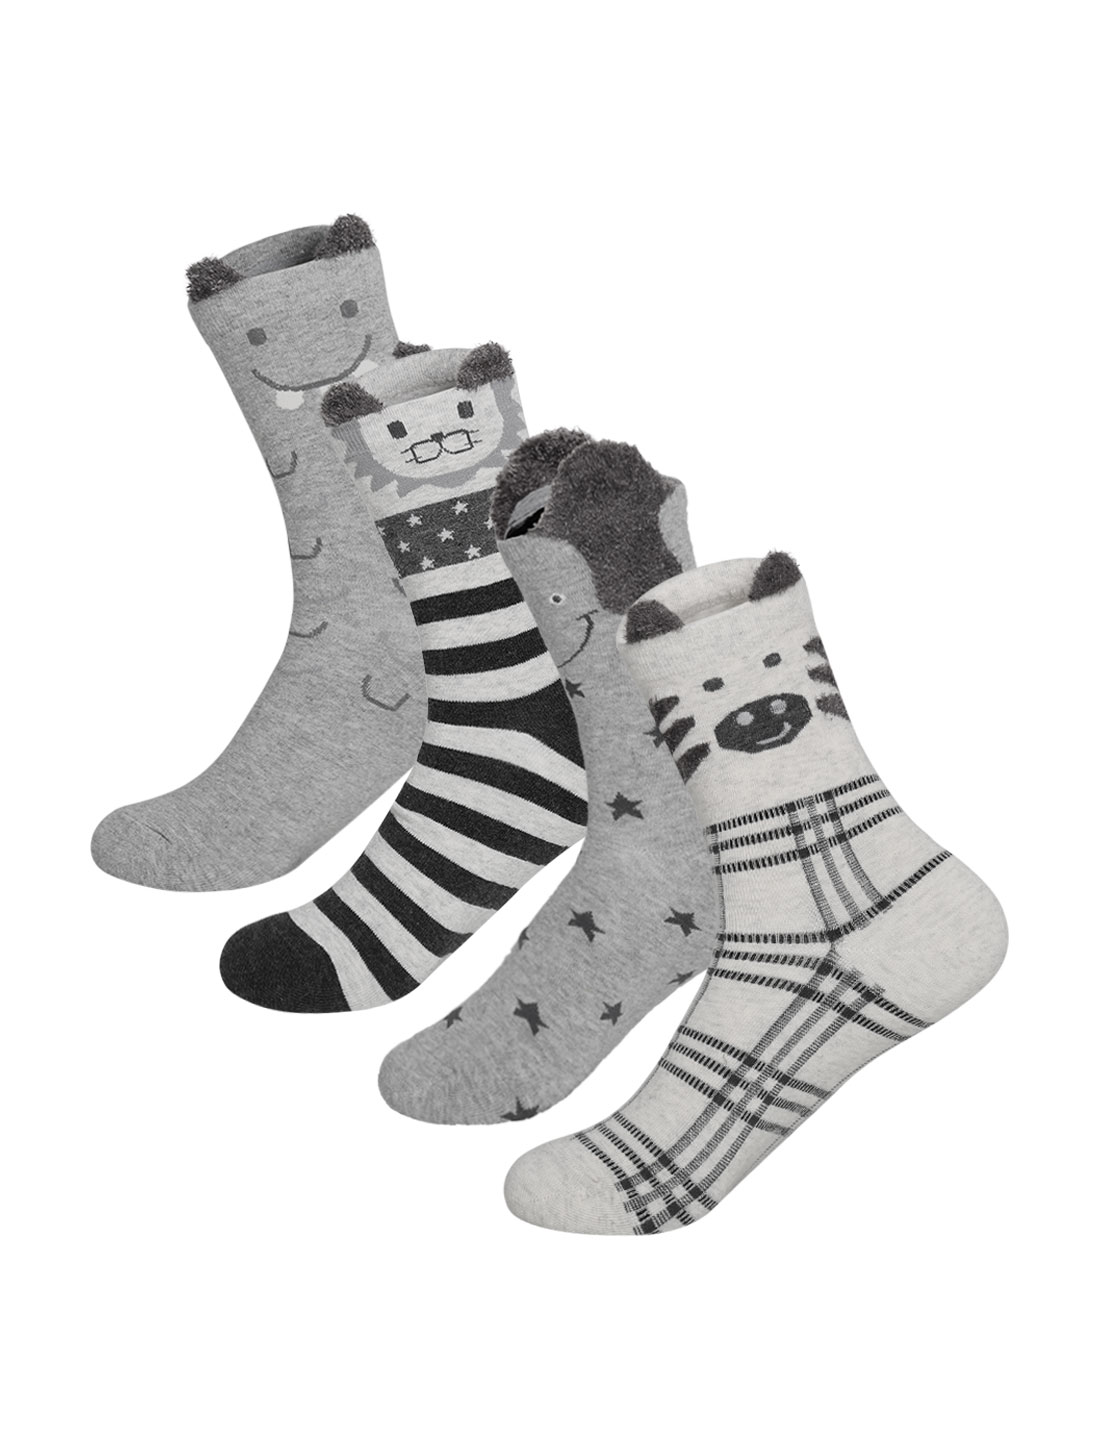 Women 4 pair Animal Stripes Stars Pattern Crew Socks 9-11 Assorted-Gray